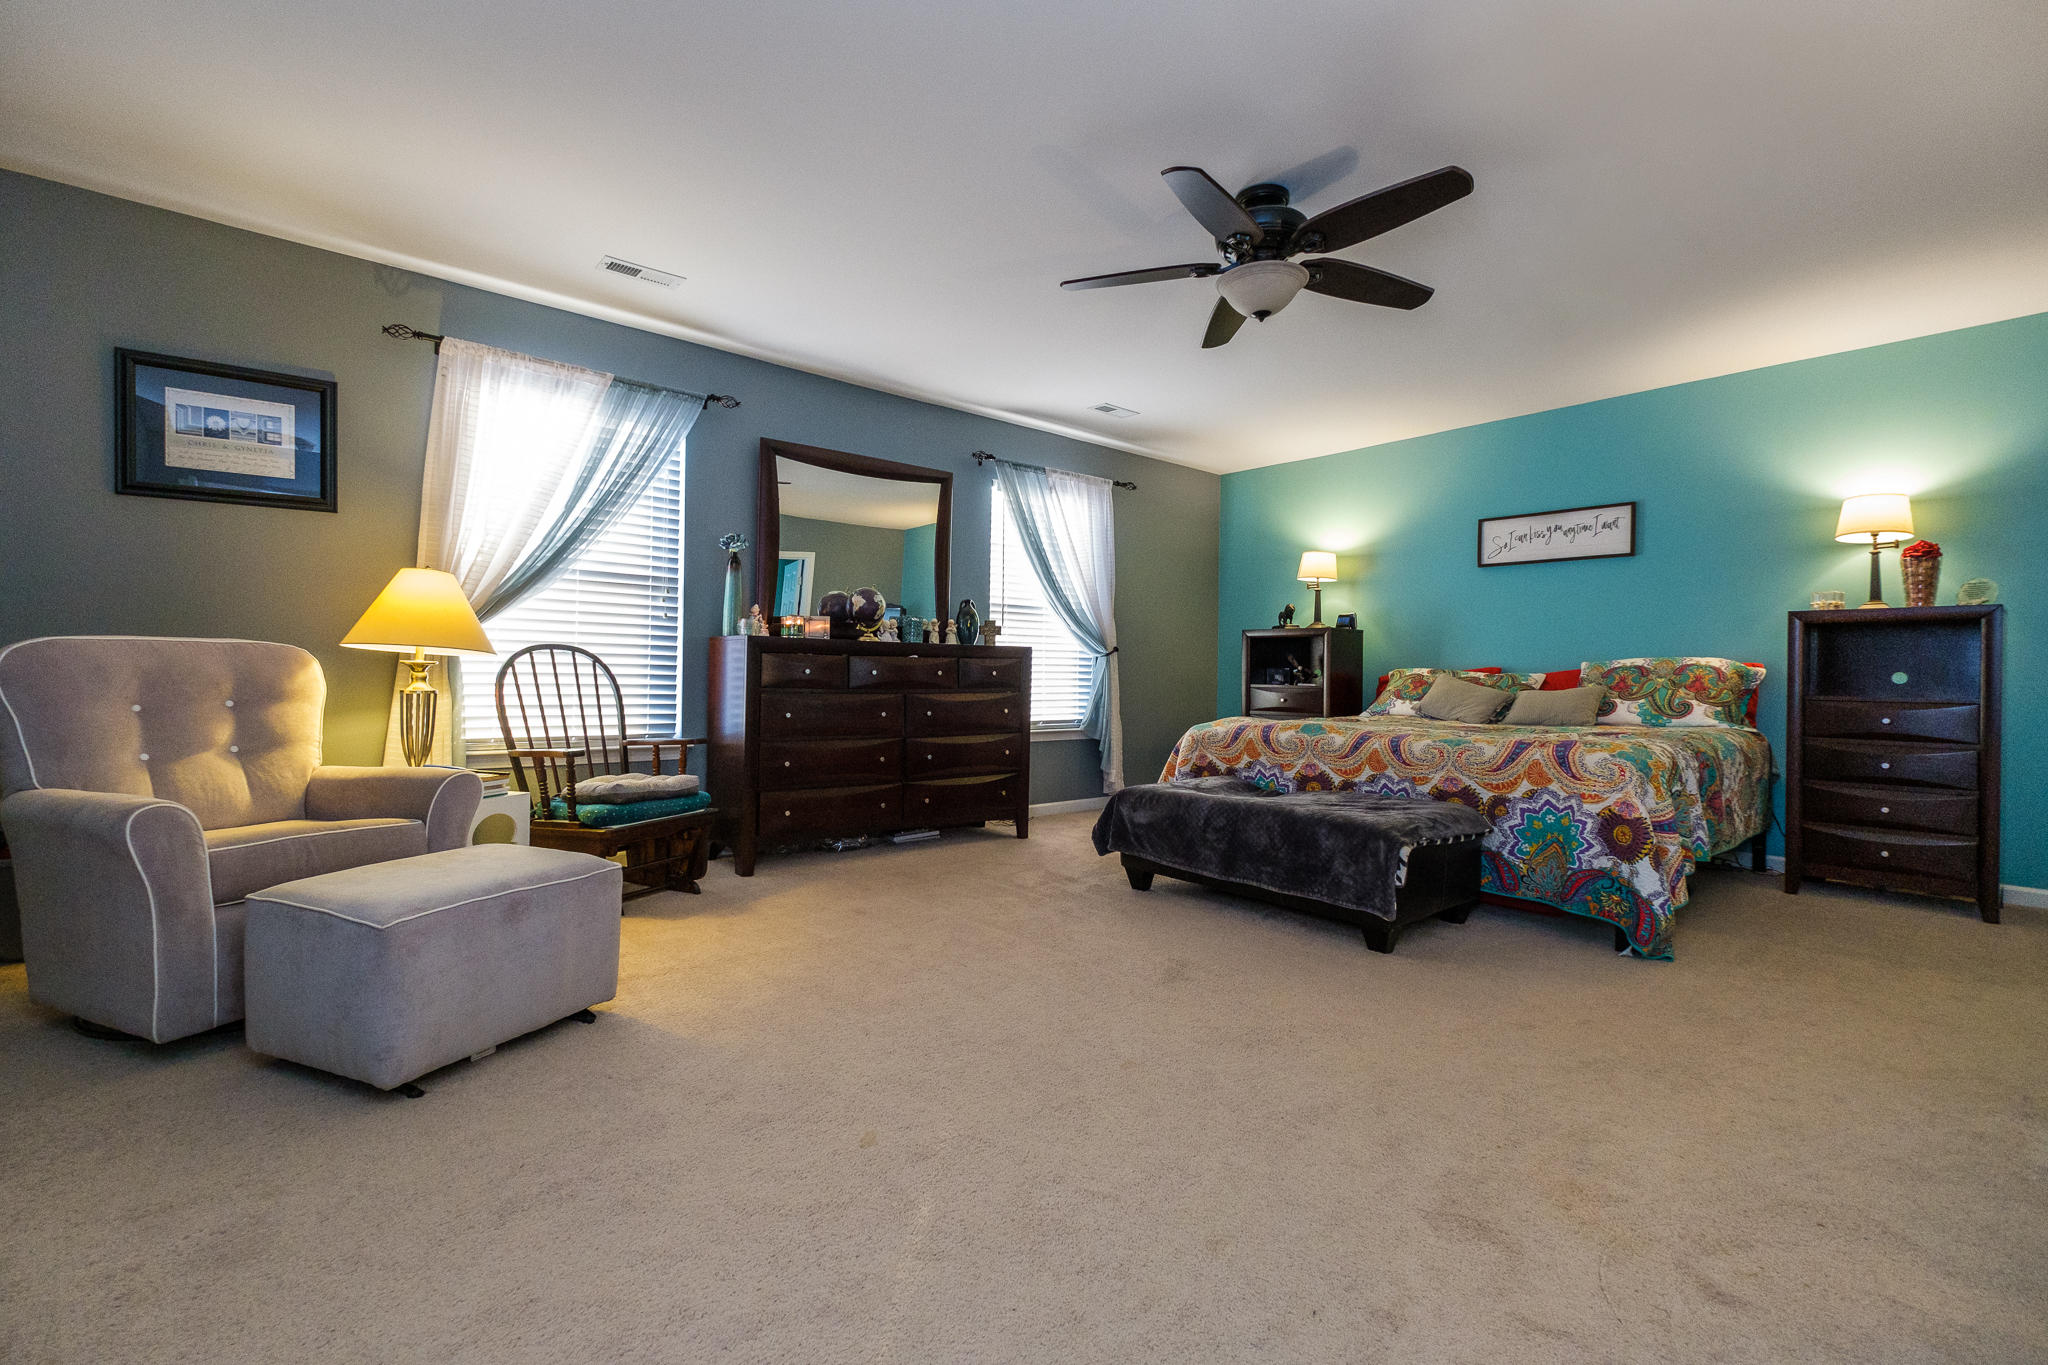 228 Laurel Crest Way Summerville, SC 29486